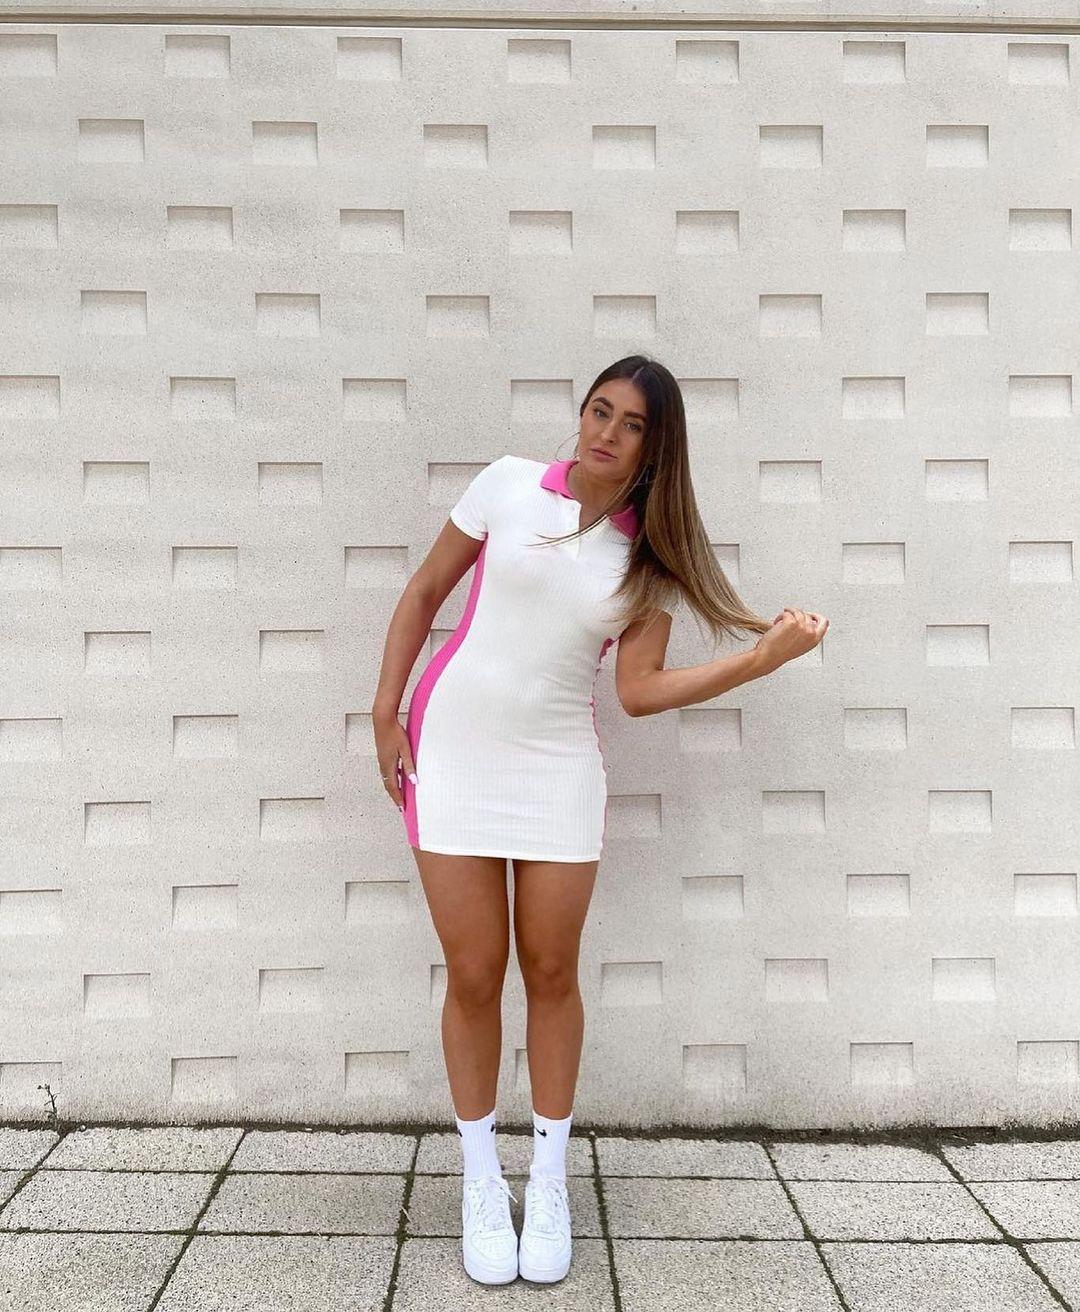 ribbed dress in contrast de Zara sur zara.style.daily